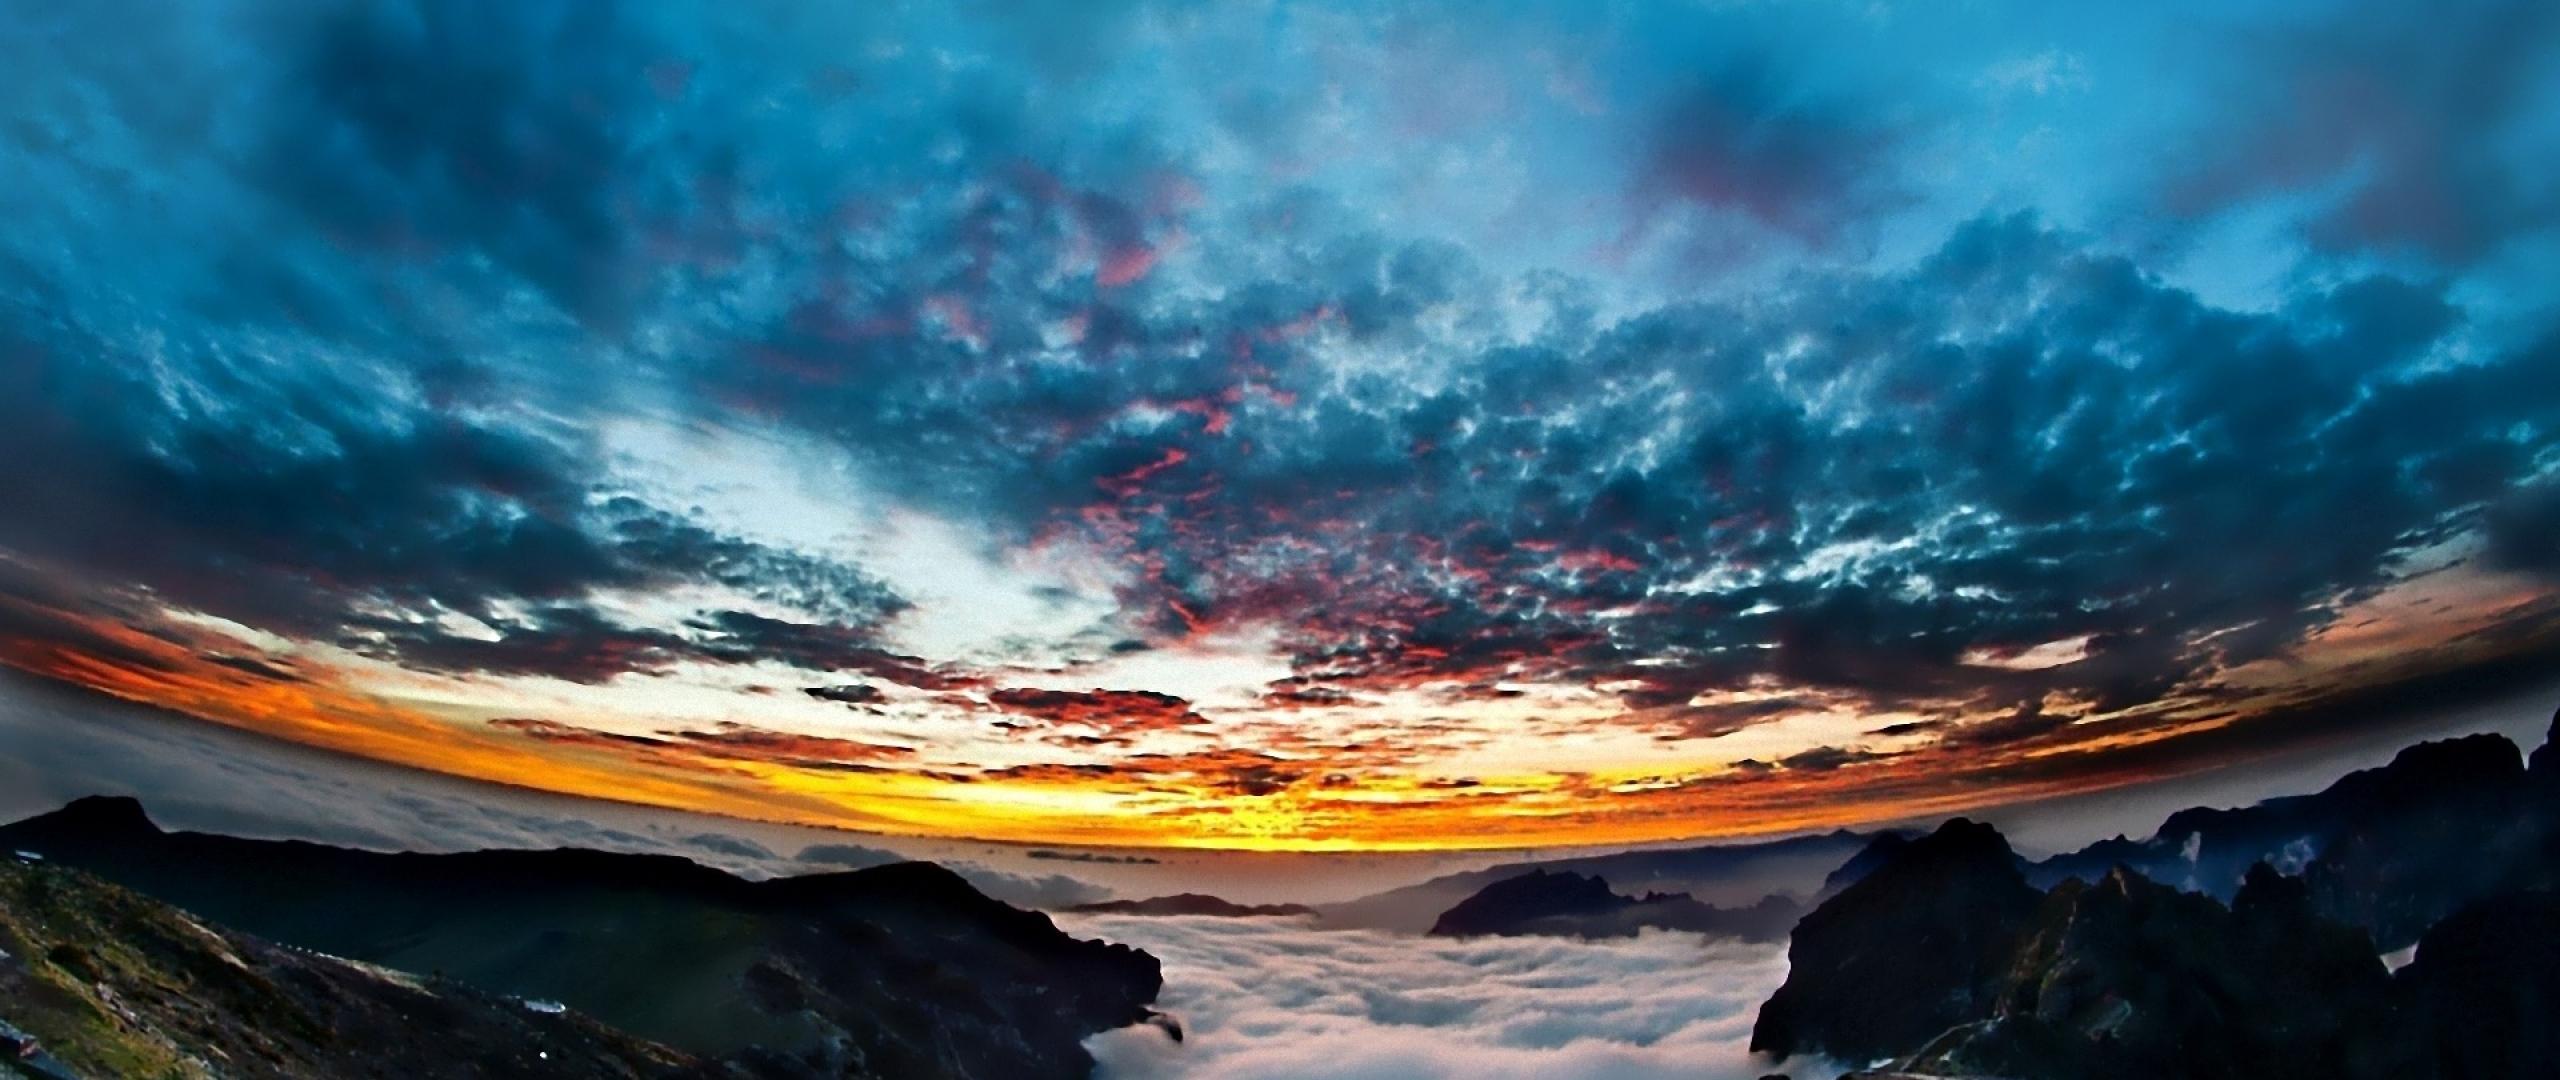 Download Wallpaper 2560x1080 Sky Sunset Panorama Landscape Night 2560x1080